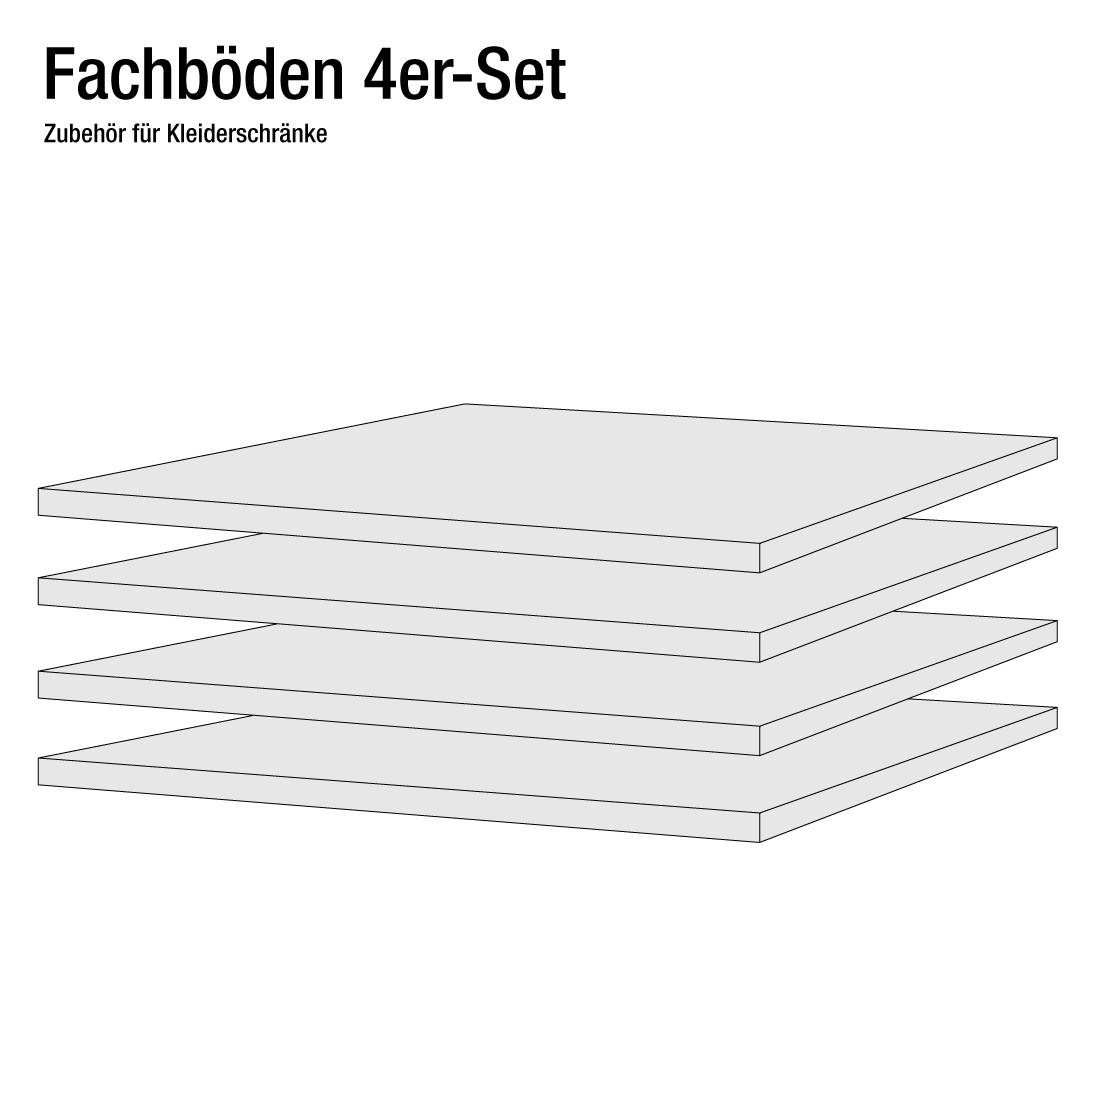 45er Fachboden (4er-Set) - Schranktiefe 60/69 cm